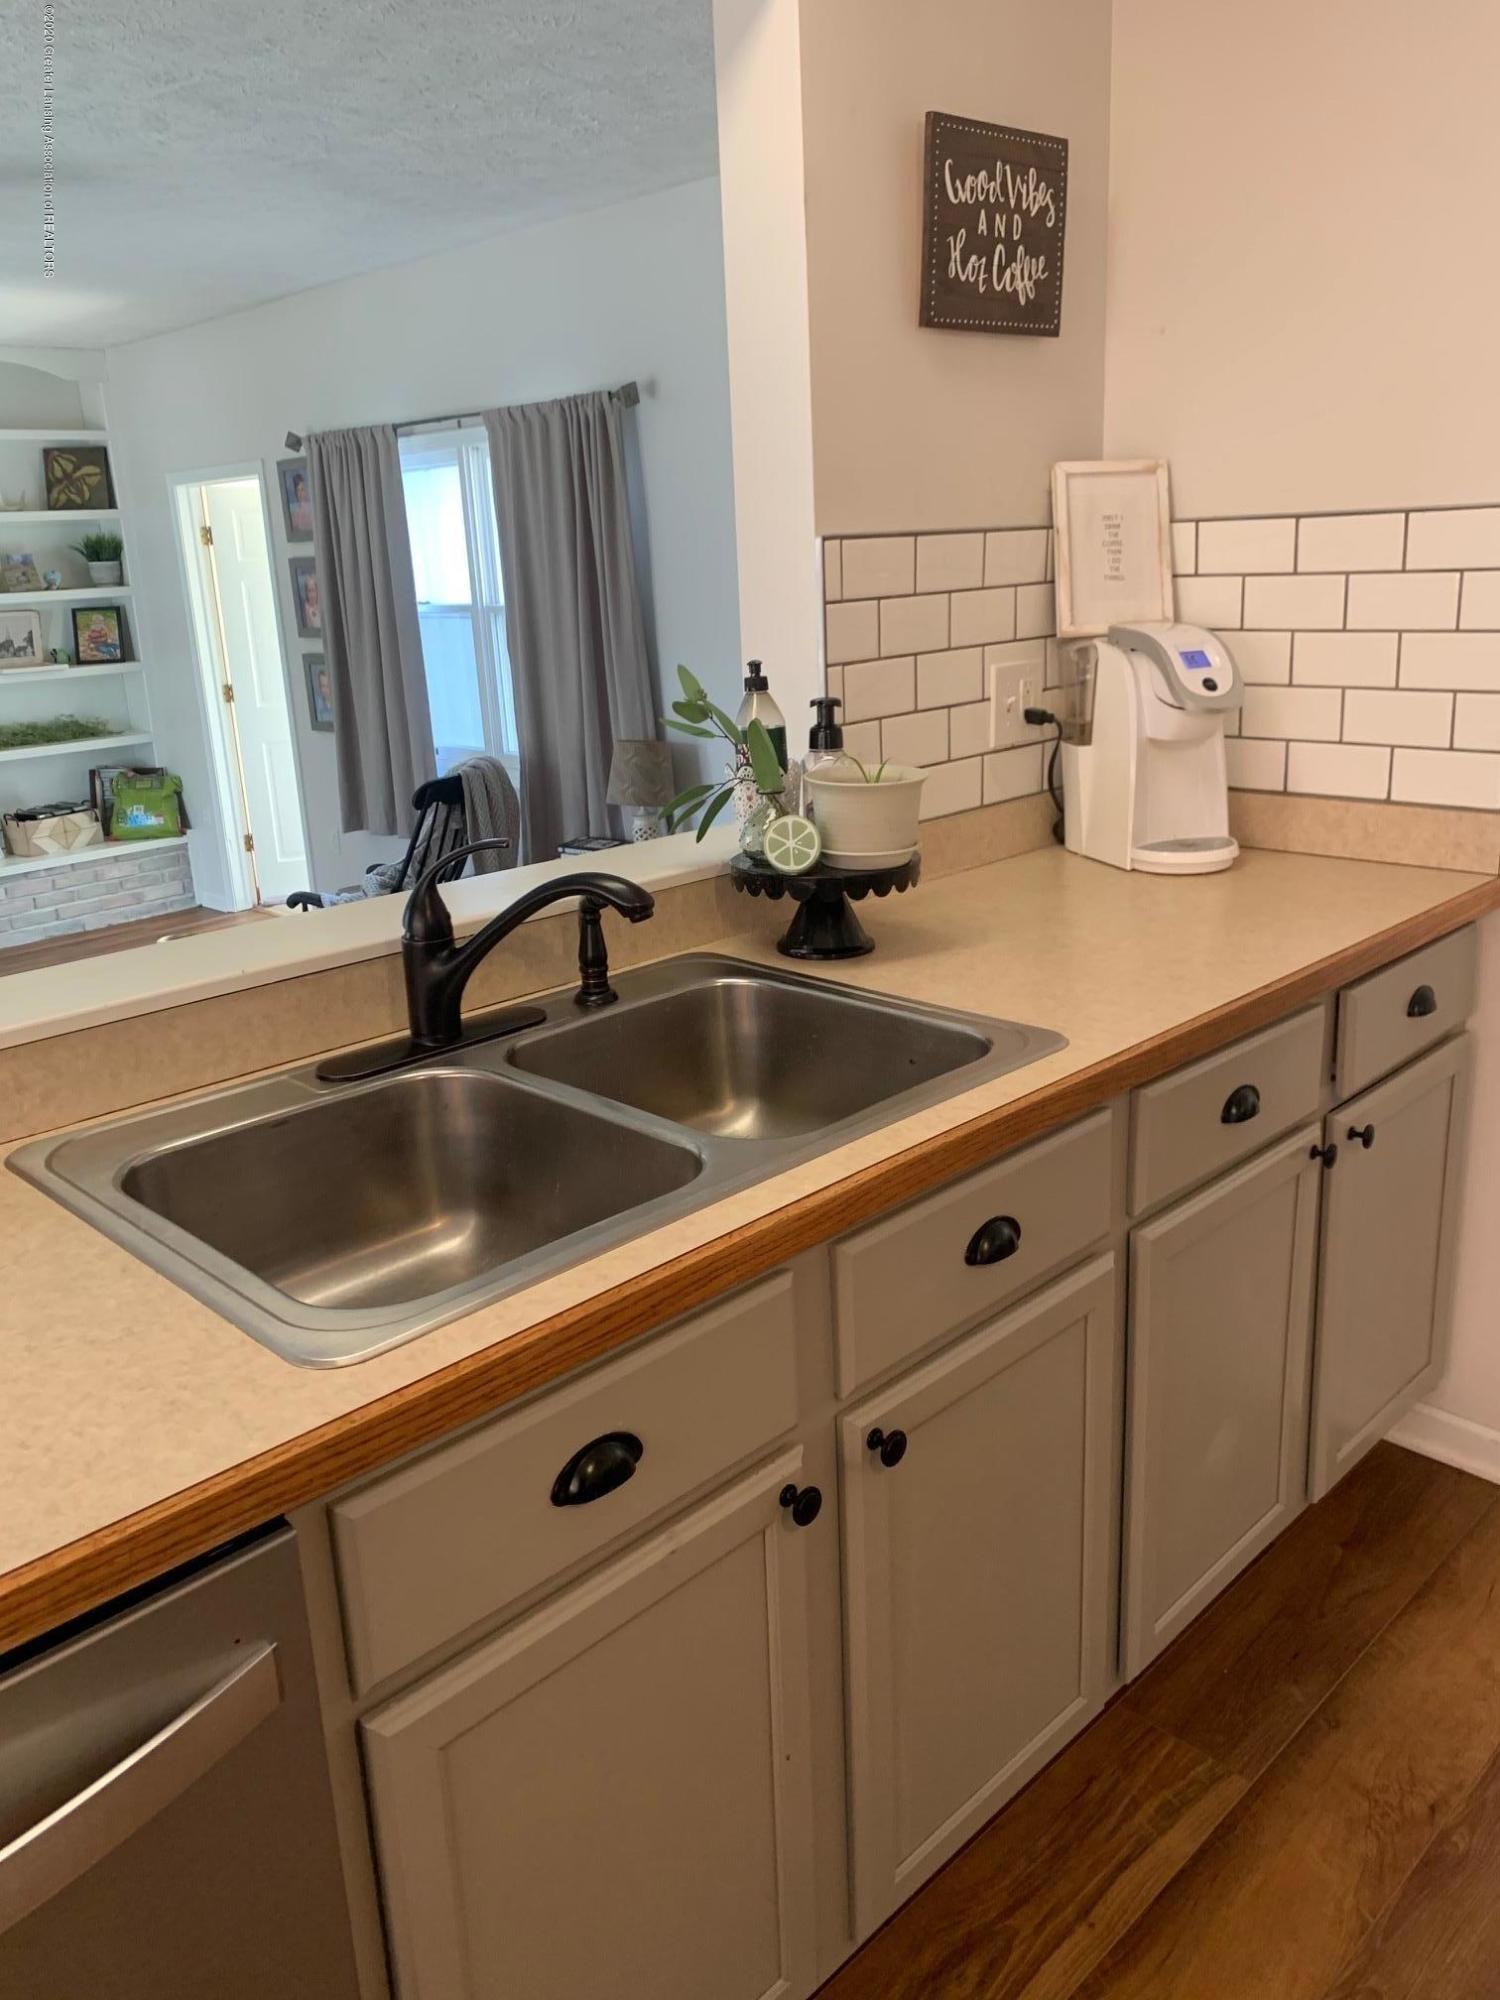 2096 S Perkey Rd - Kitchen - 9